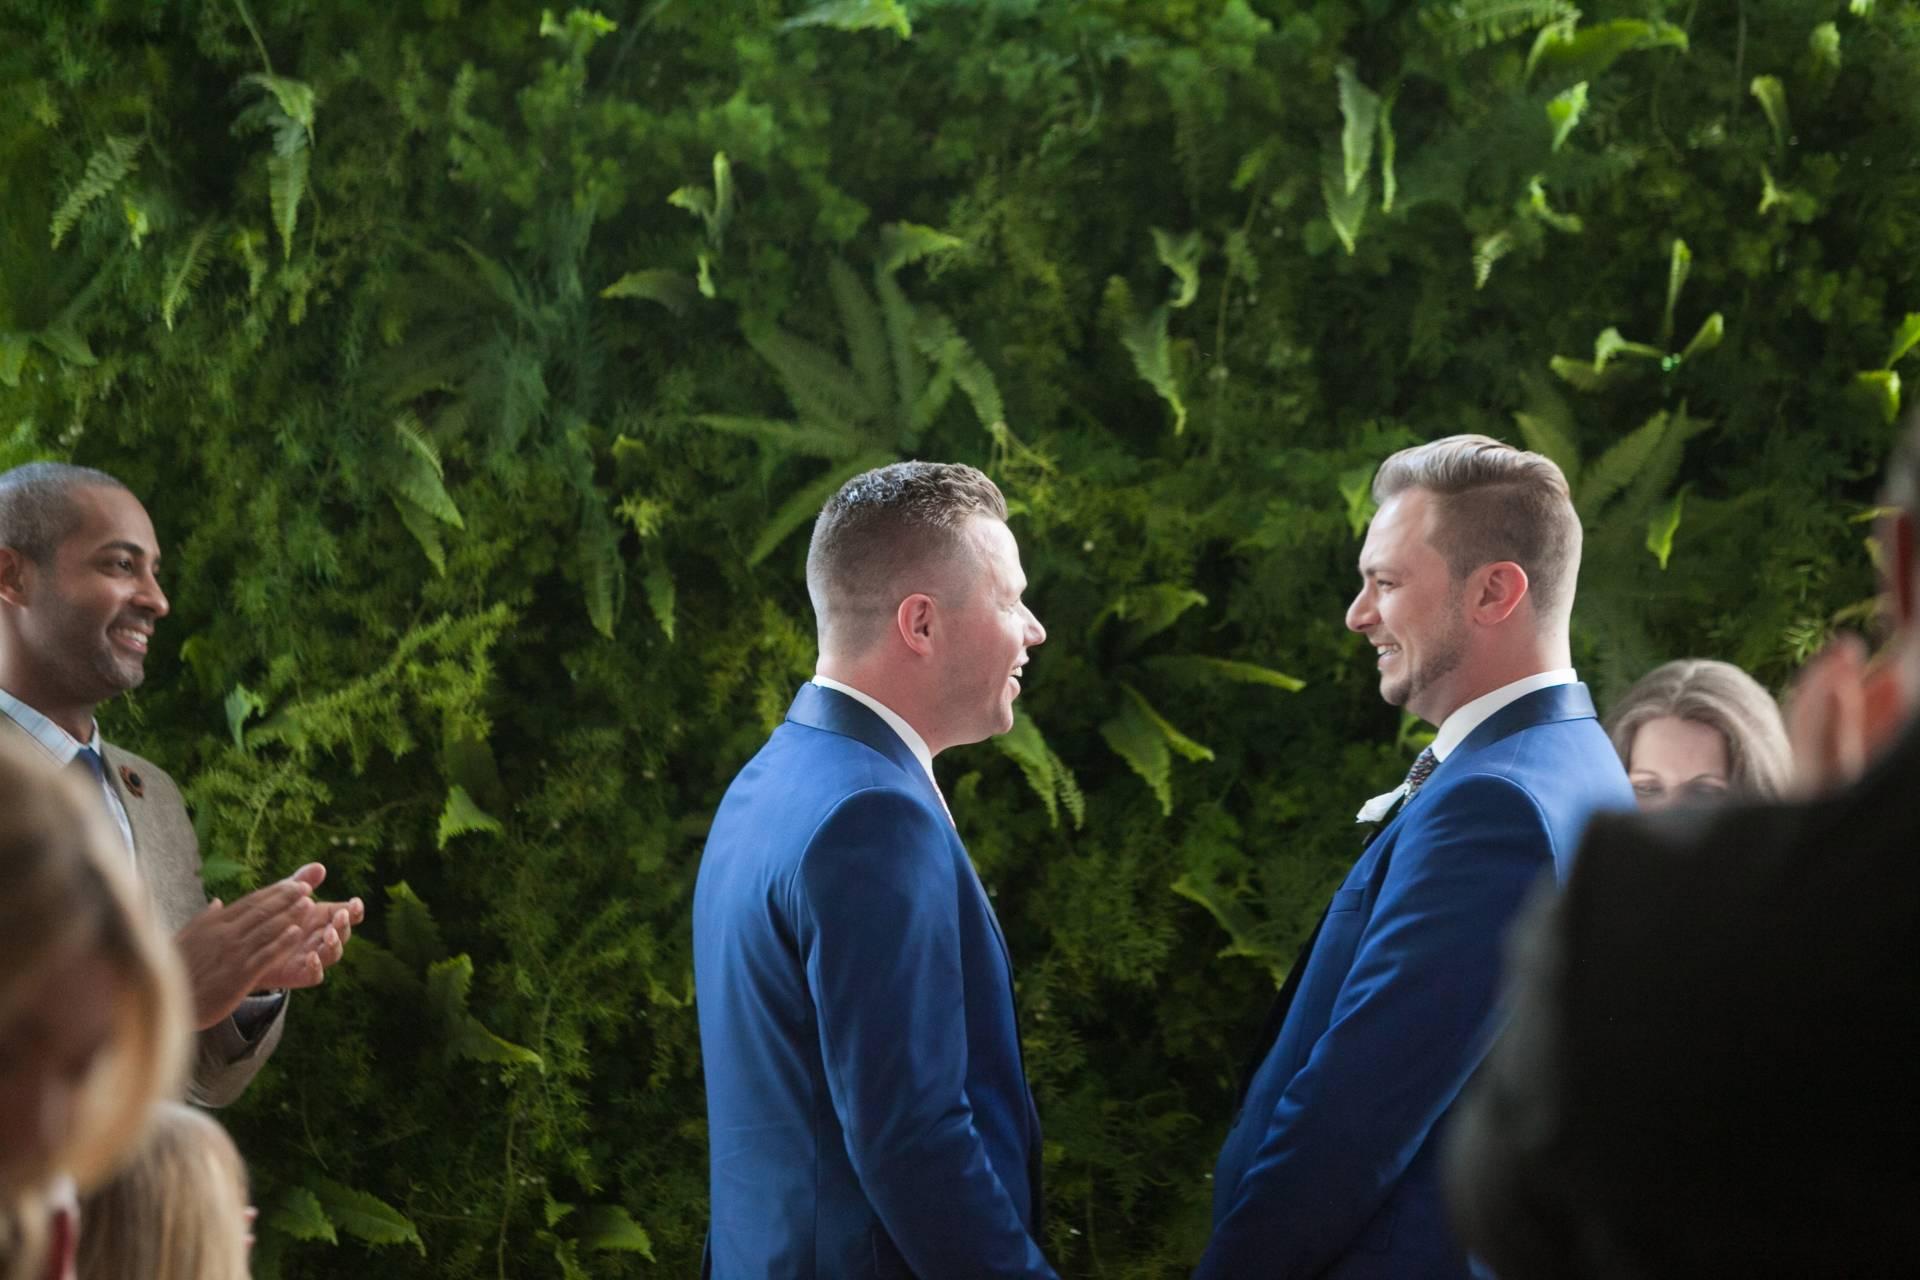 Turn a Typical Toronto Backyard into a Wedding Venue